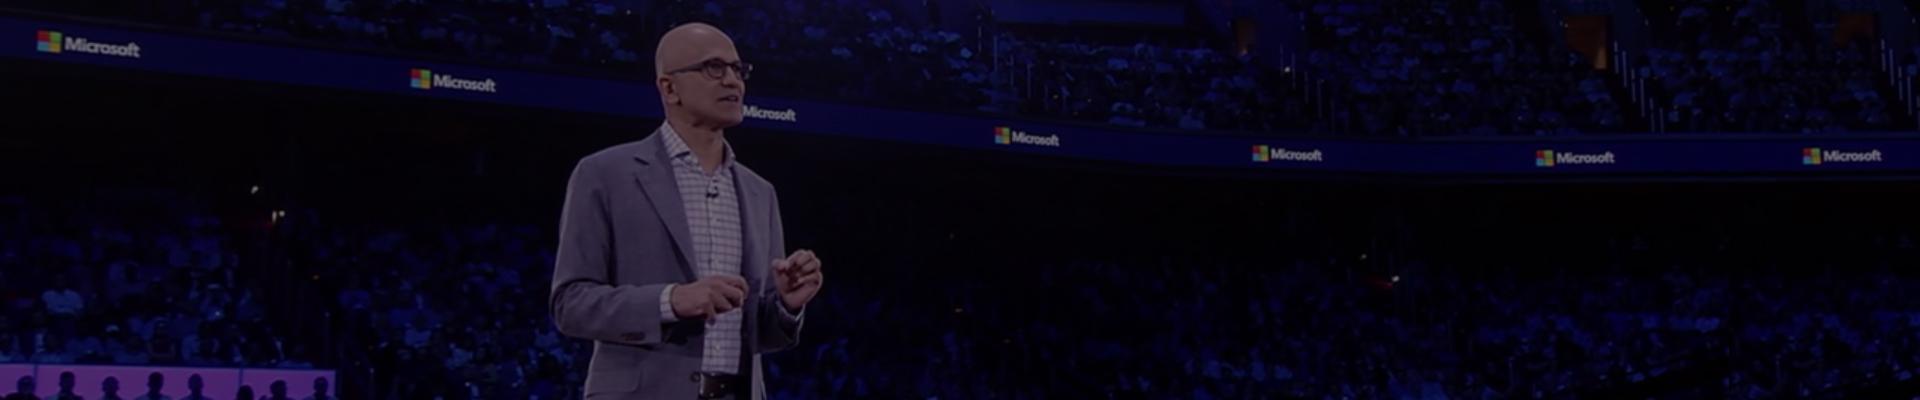 Regardez Satya annoncer Microsoft365